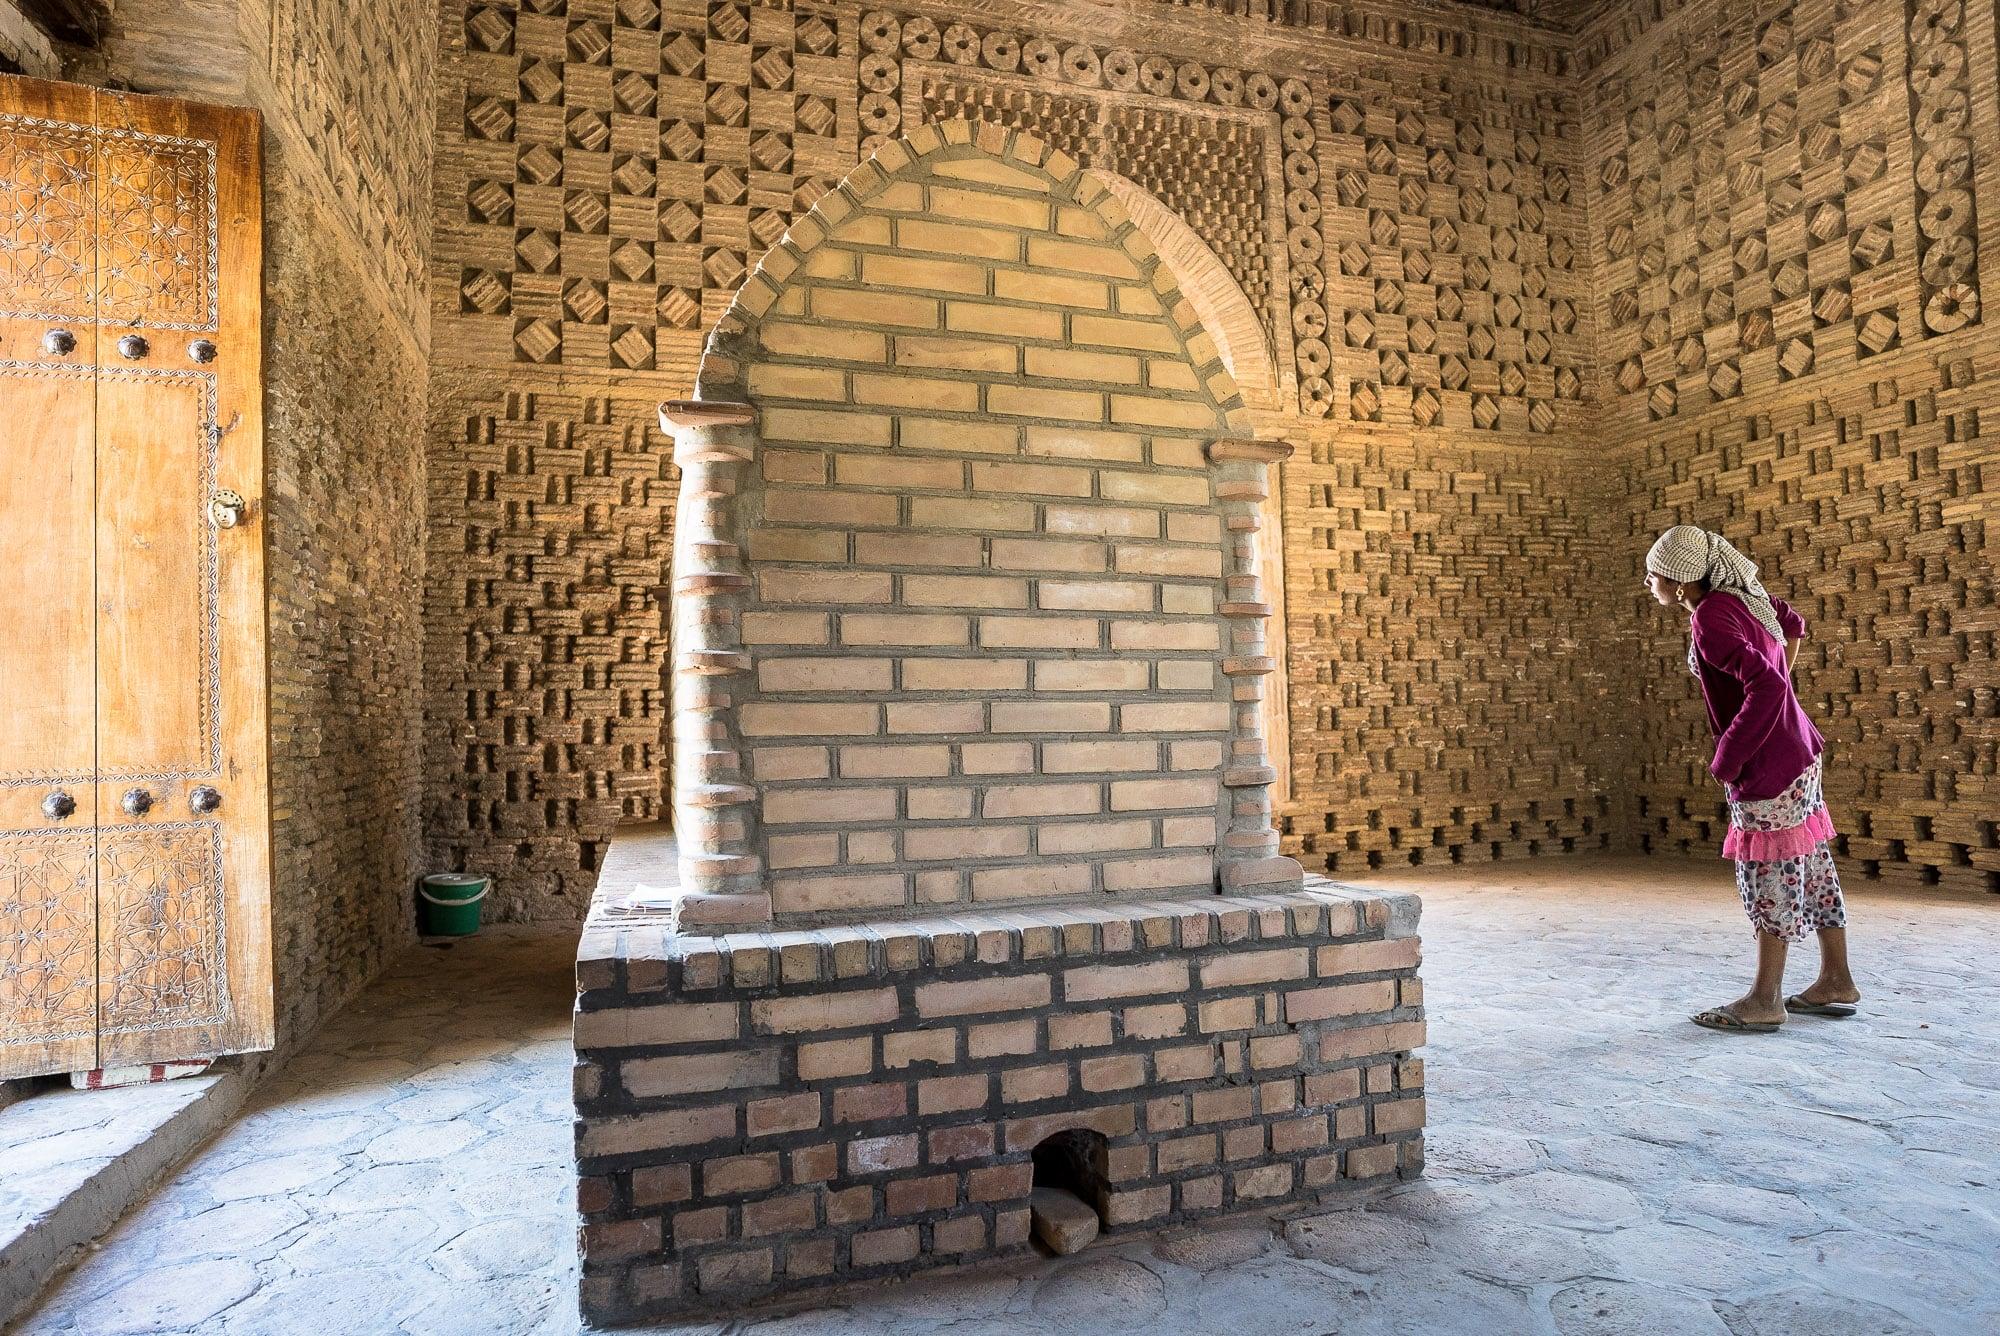 Ismail Samani's mausoleum